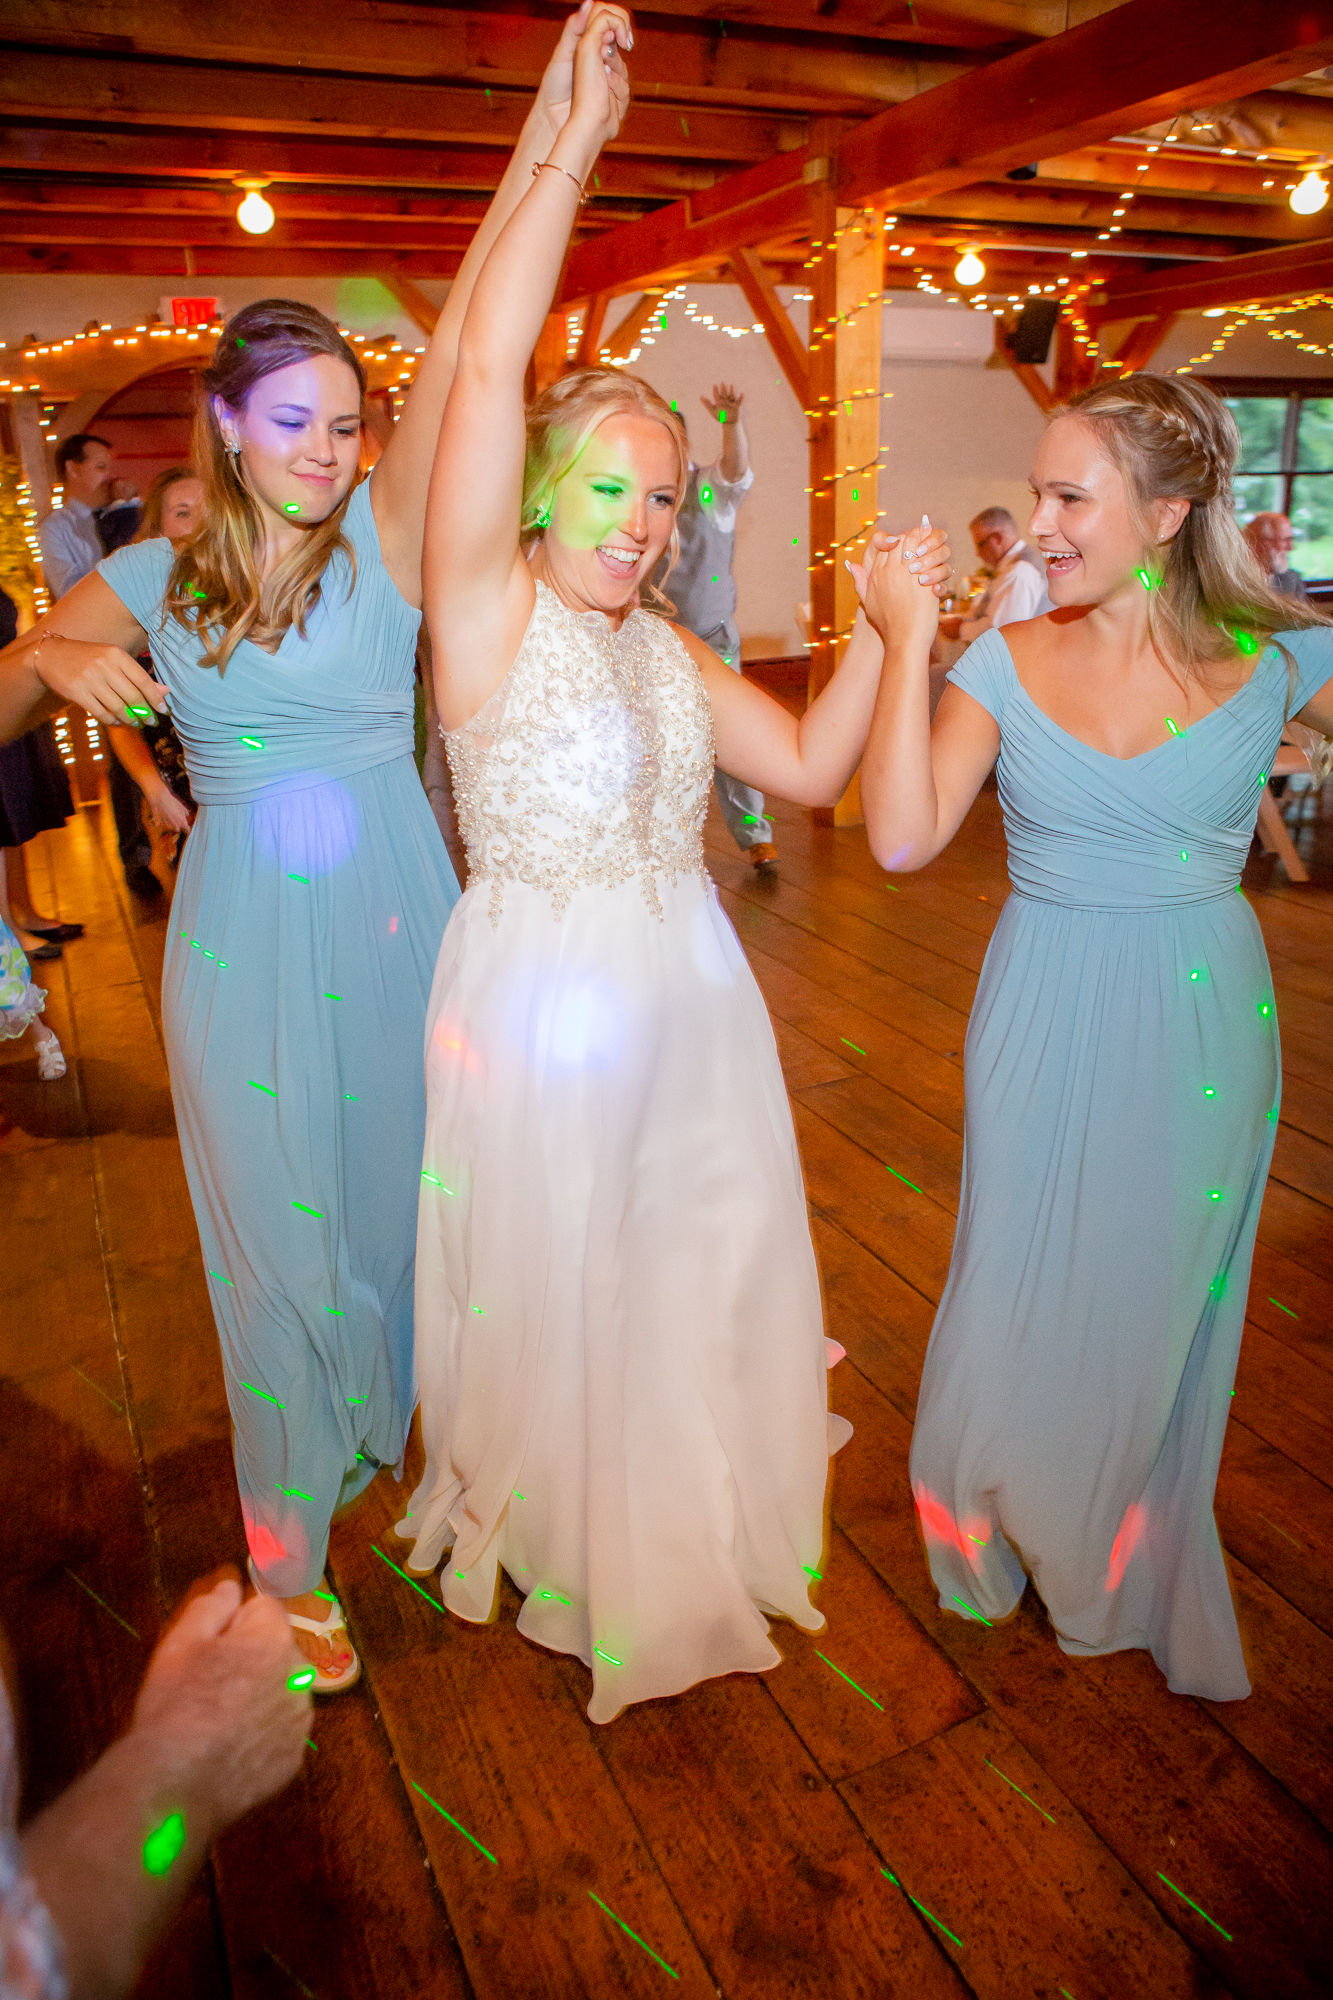 Wedding-Carriage-House-Oneonta-NY-1089.jpg